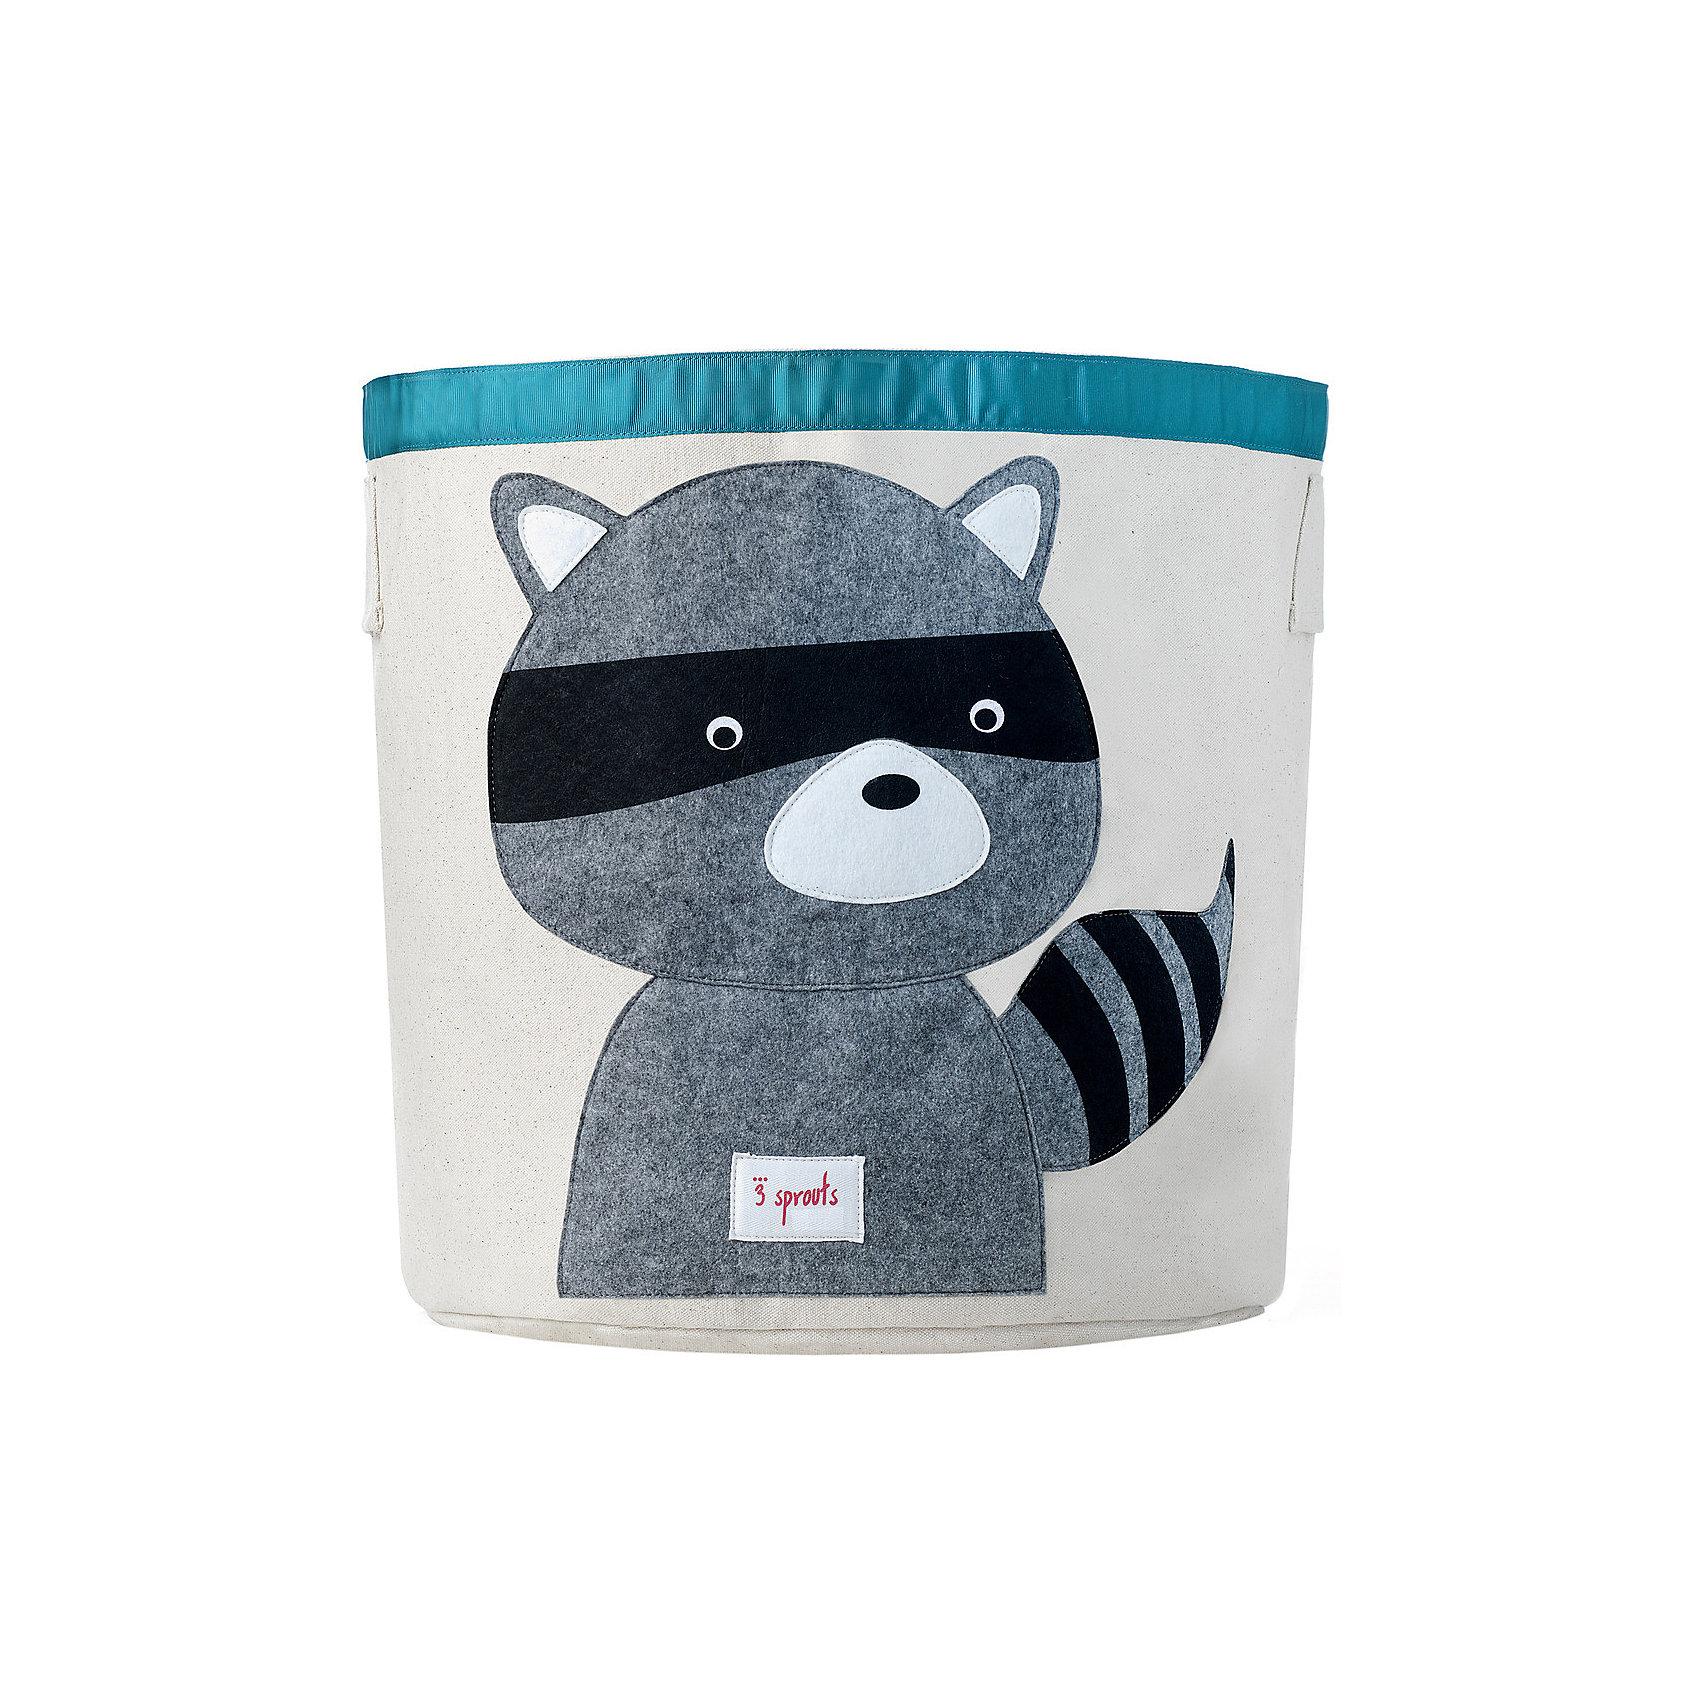 3 Sprouts Корзина для хранения Енот (Grey Raccoon), 3 Sprouts raccoon fur hats 100